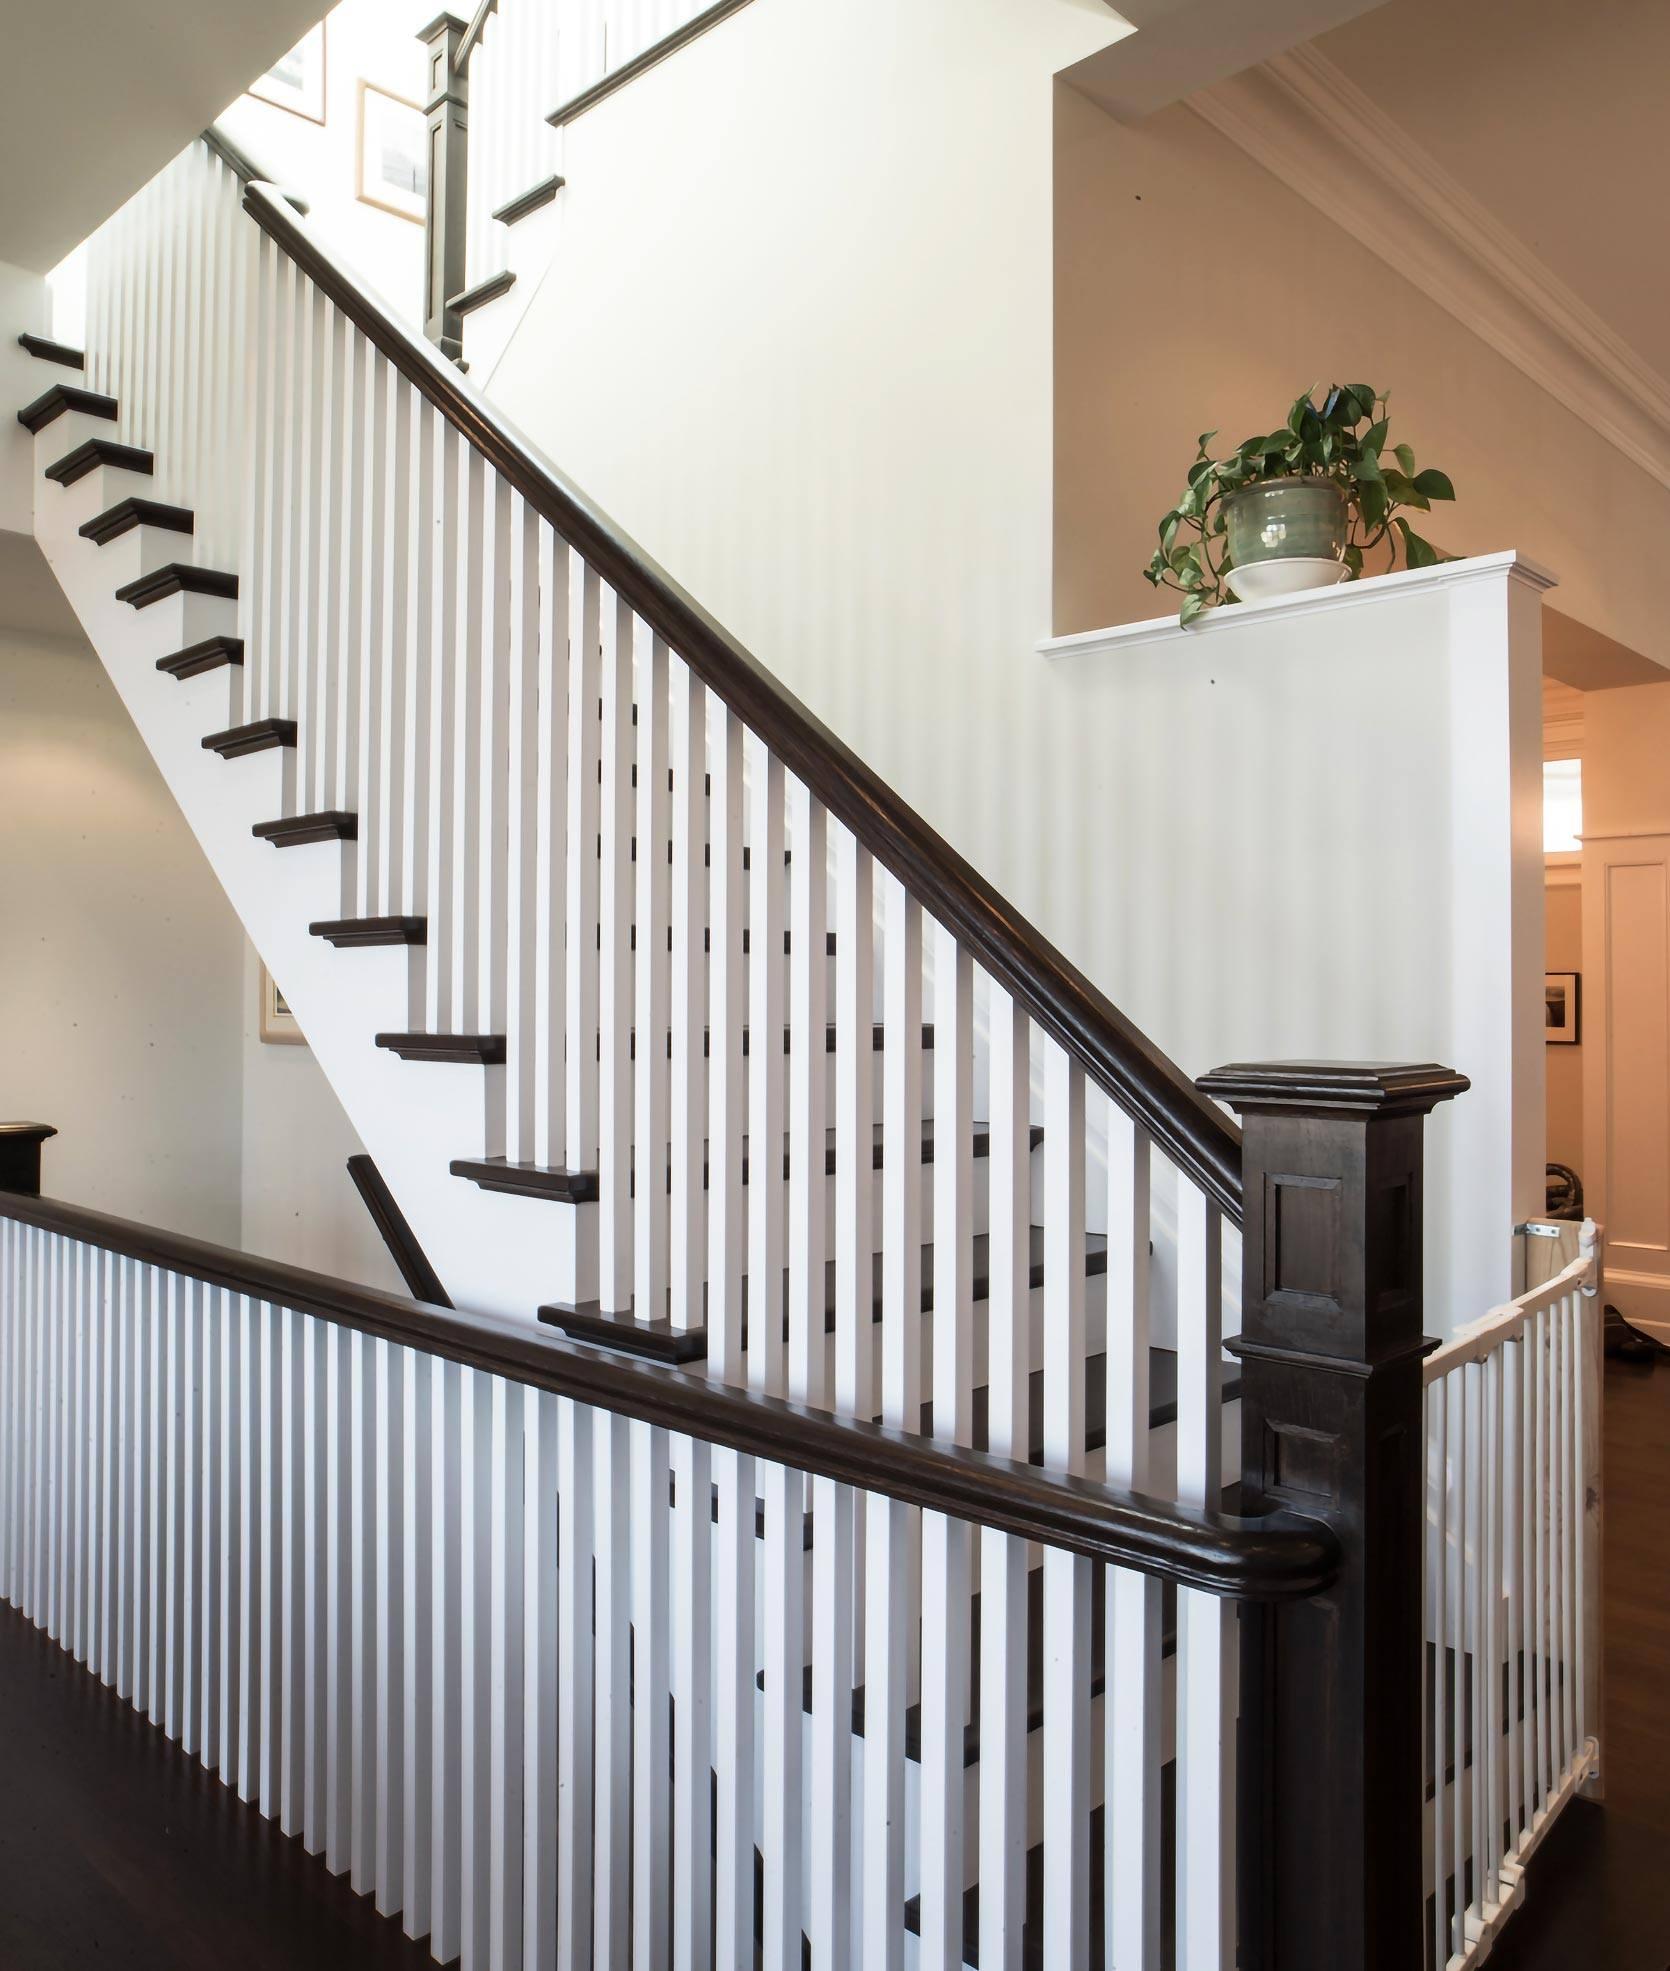 severnwoods-leaside-house-staircase